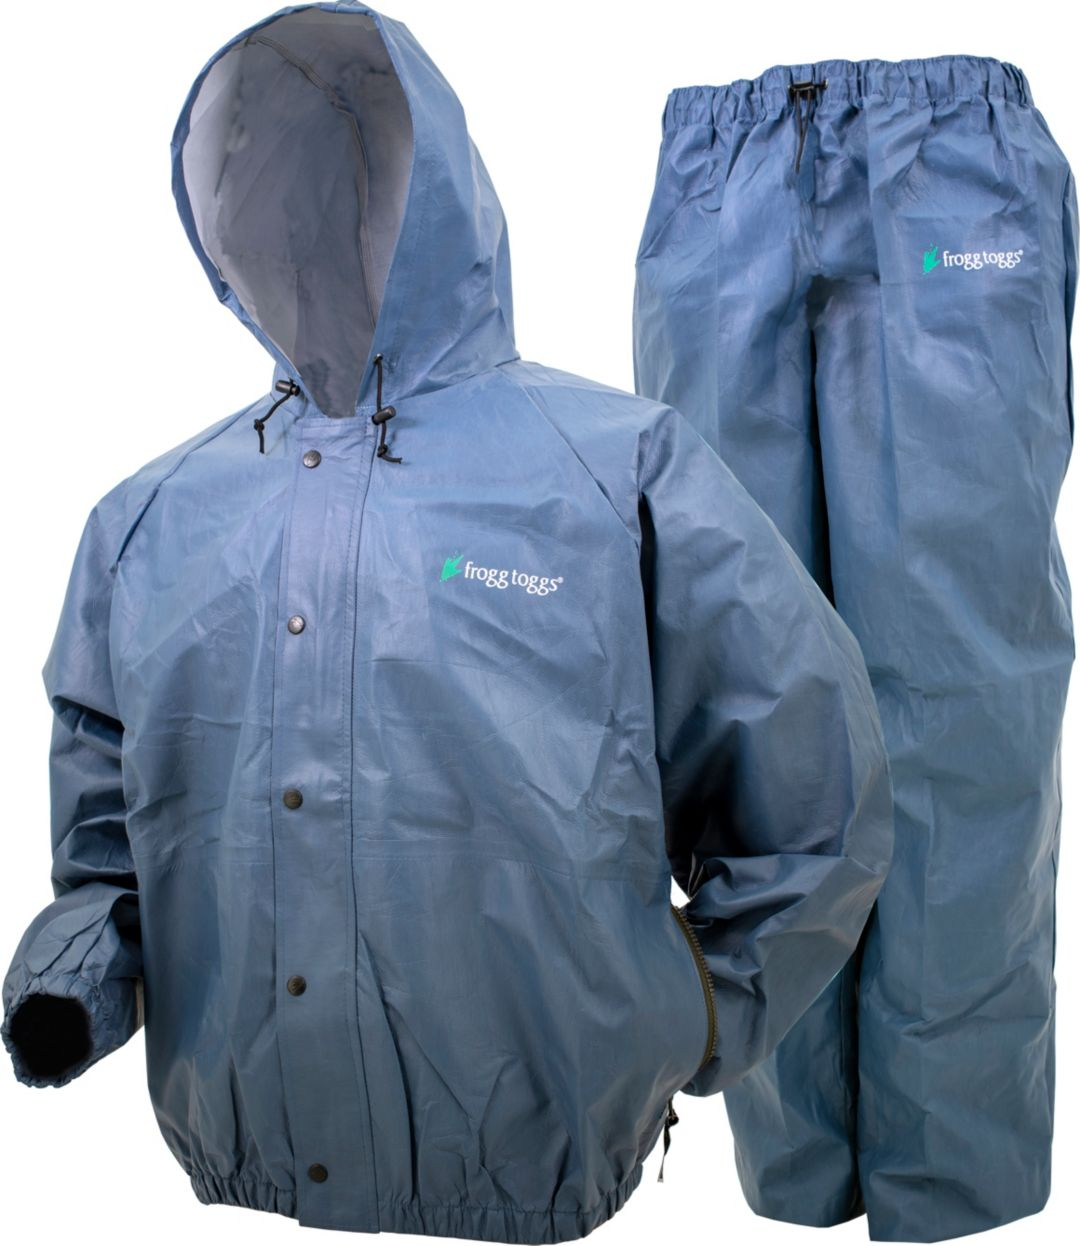 f0a9b6efc Frogg Toggs Men's Pro Action II Rain Suit